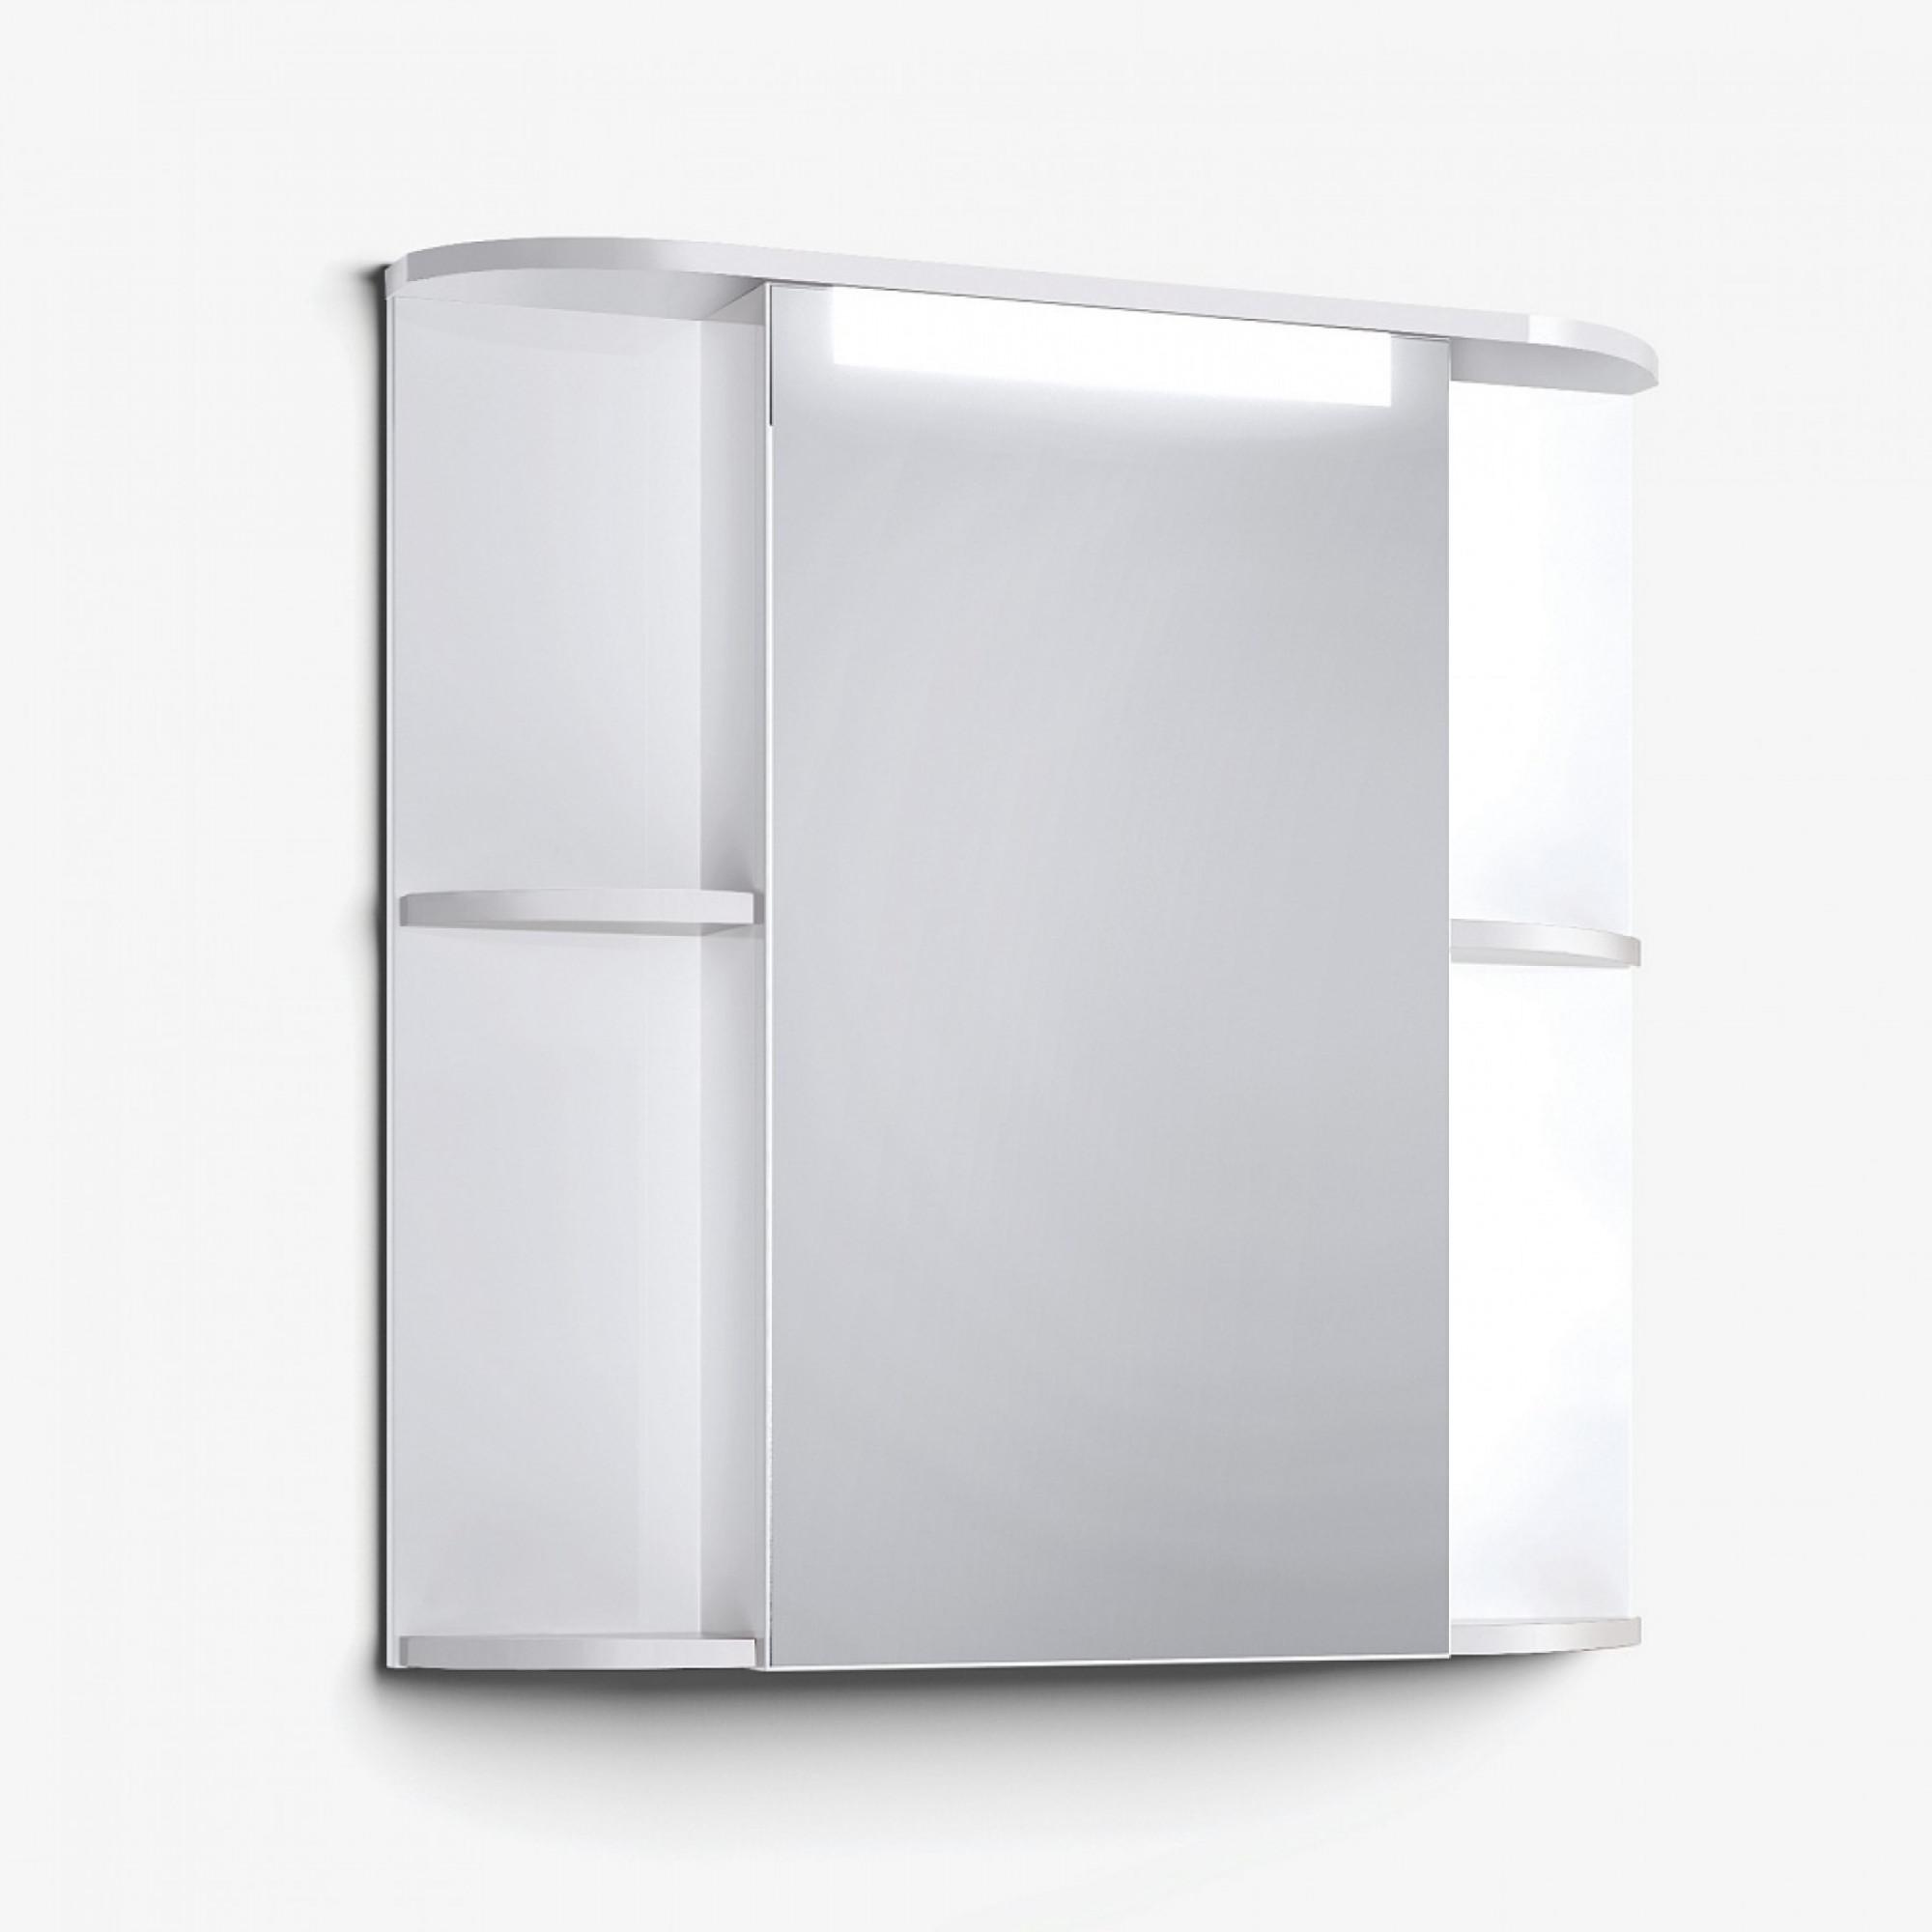 Шкаф зеркальный Latte 75 белый +8 650 руб.